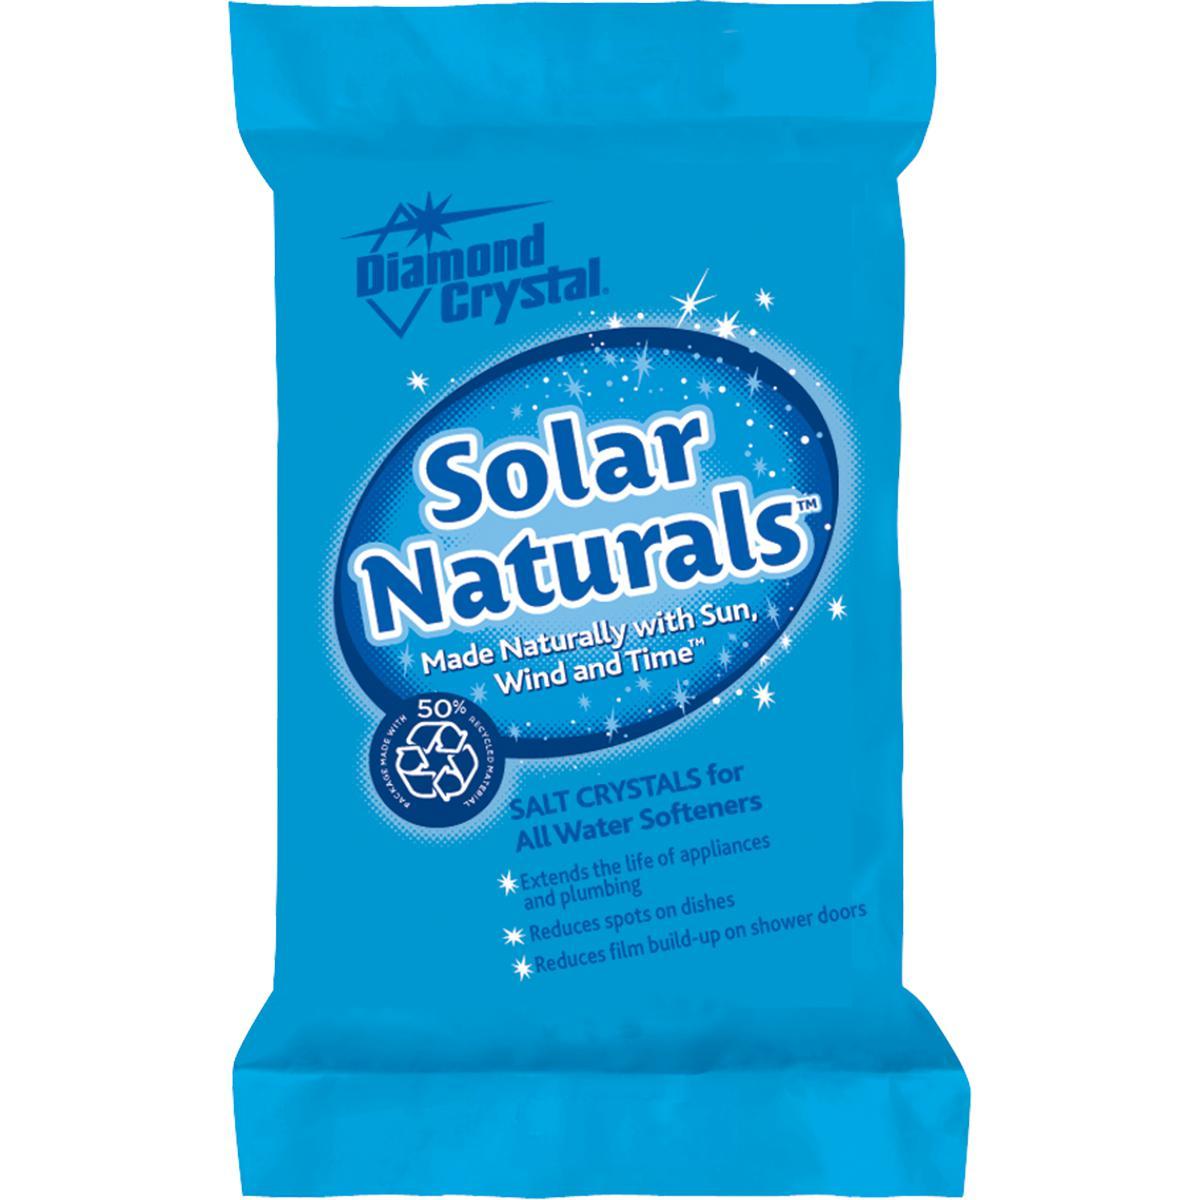 013600749408 Upc Diamond Crystal 804017 Solar Naturals